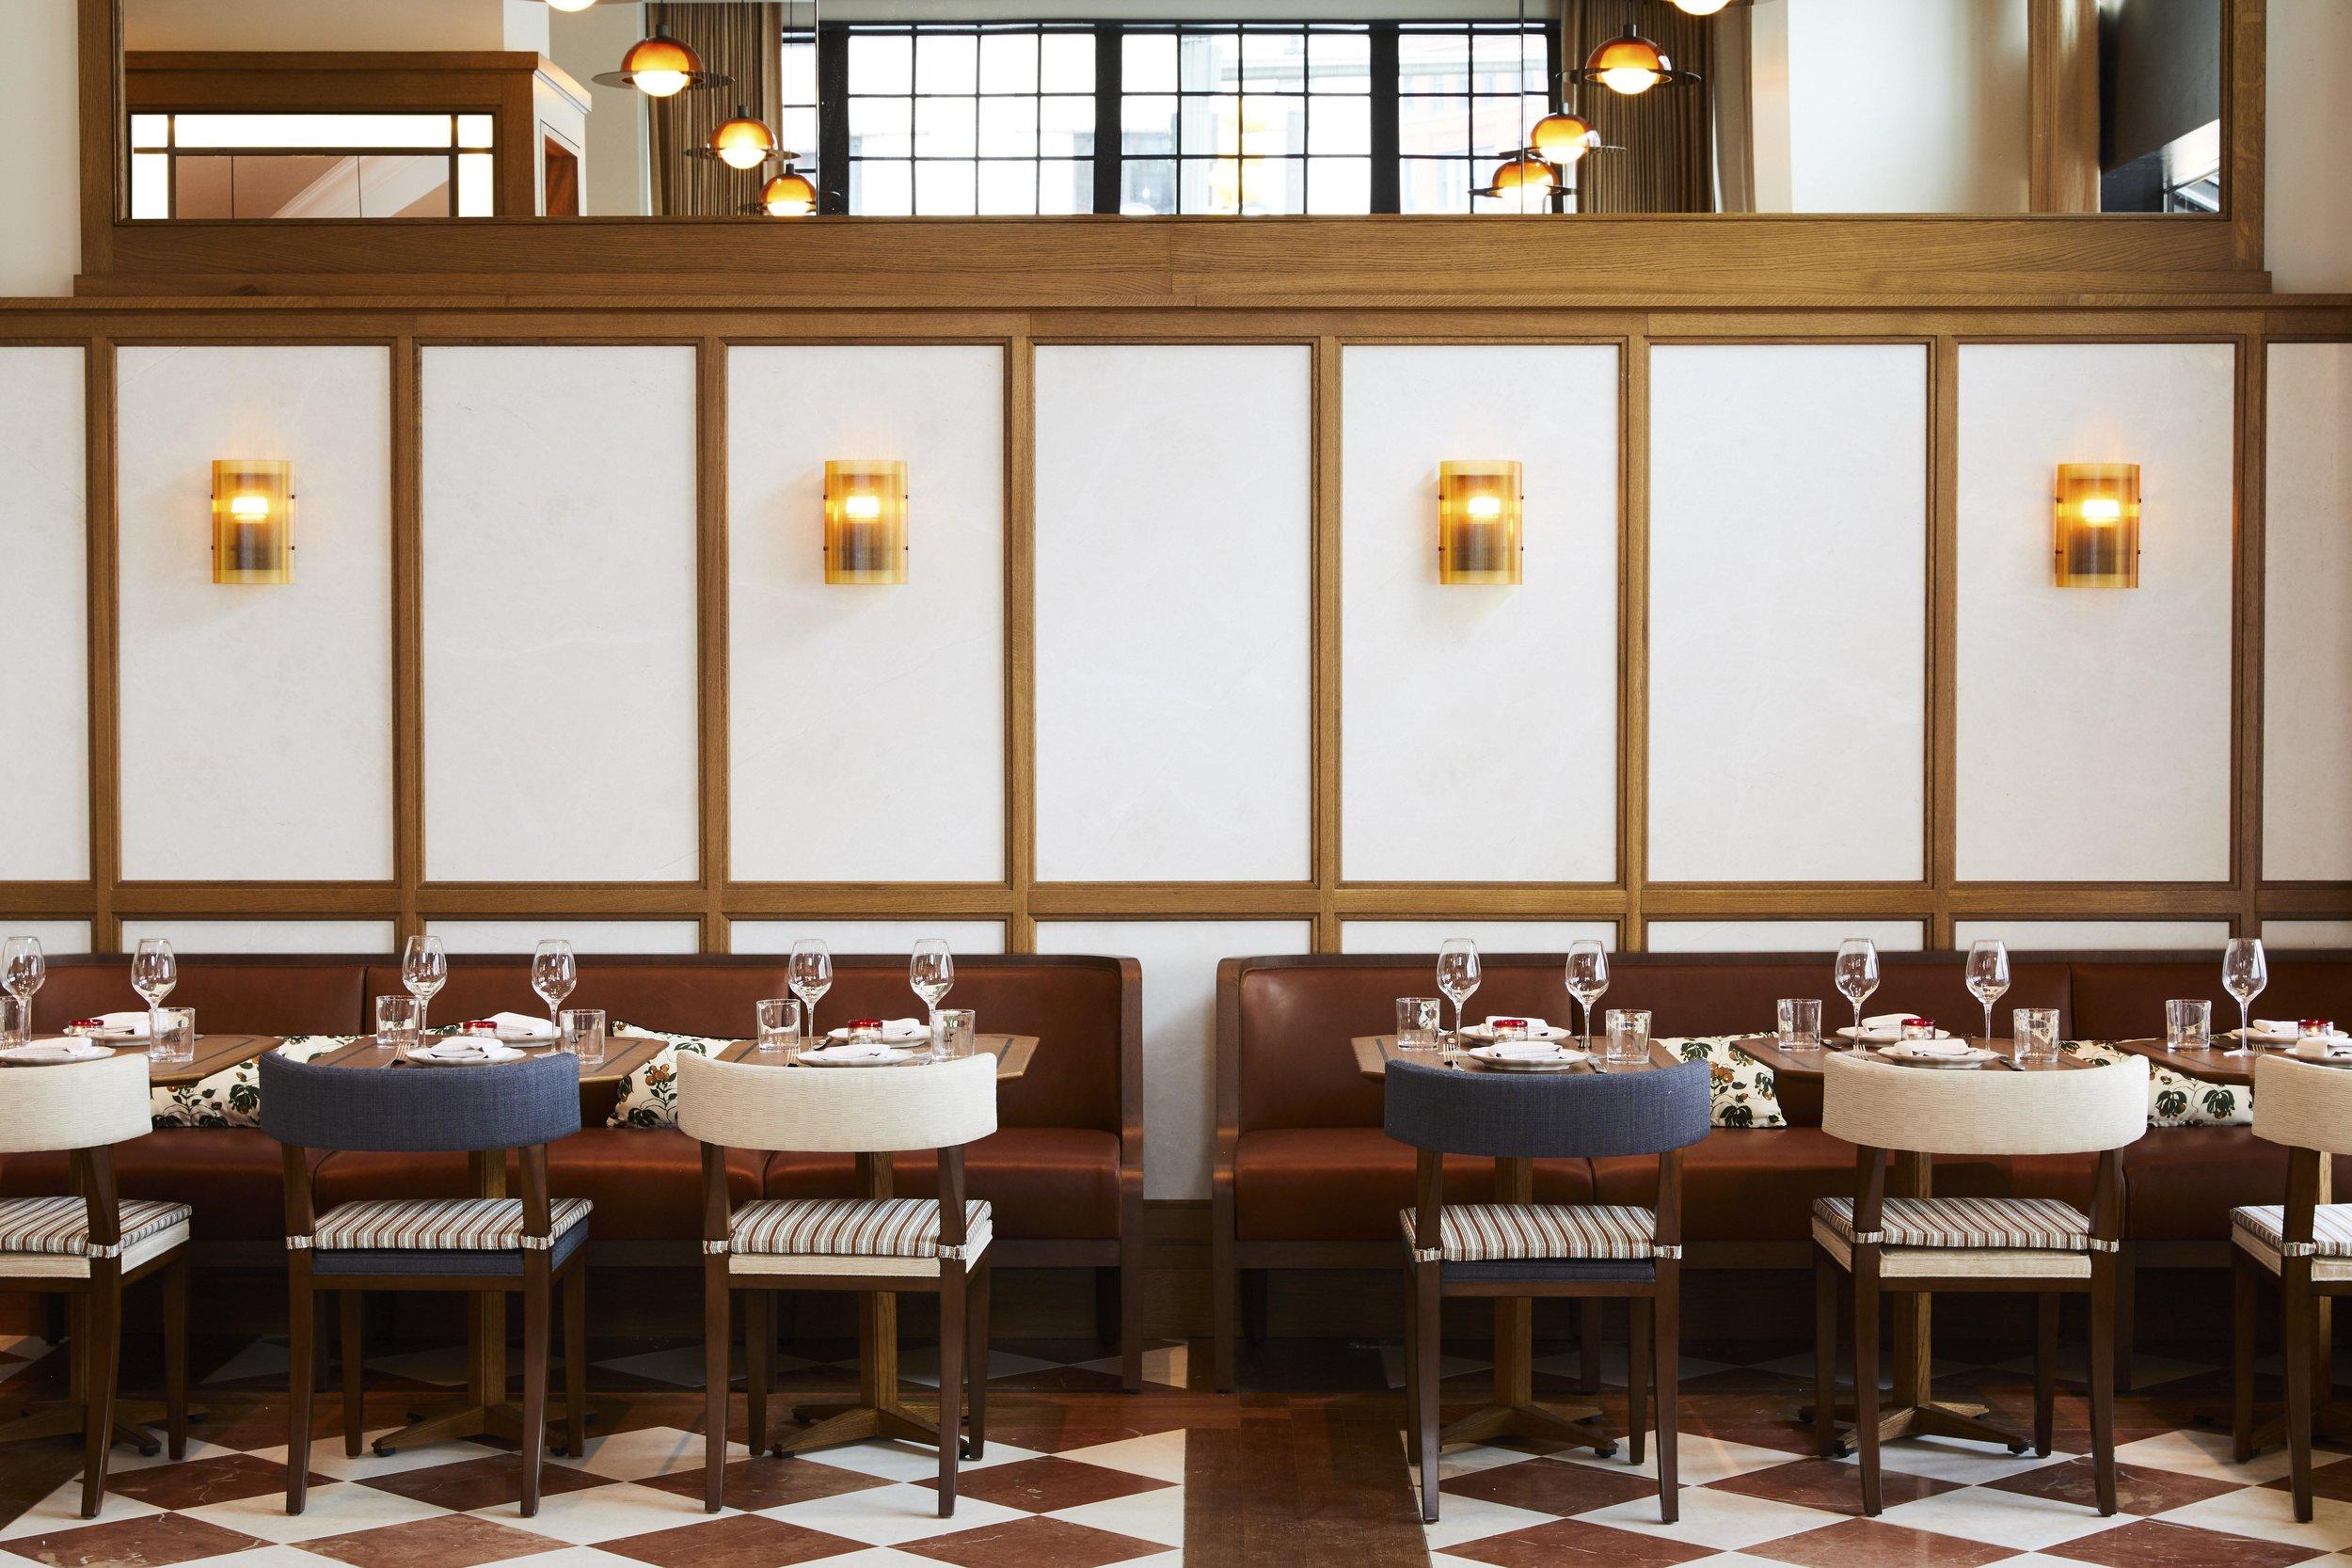 Shinola_San Morello_Restaurant_023 copy.jpg